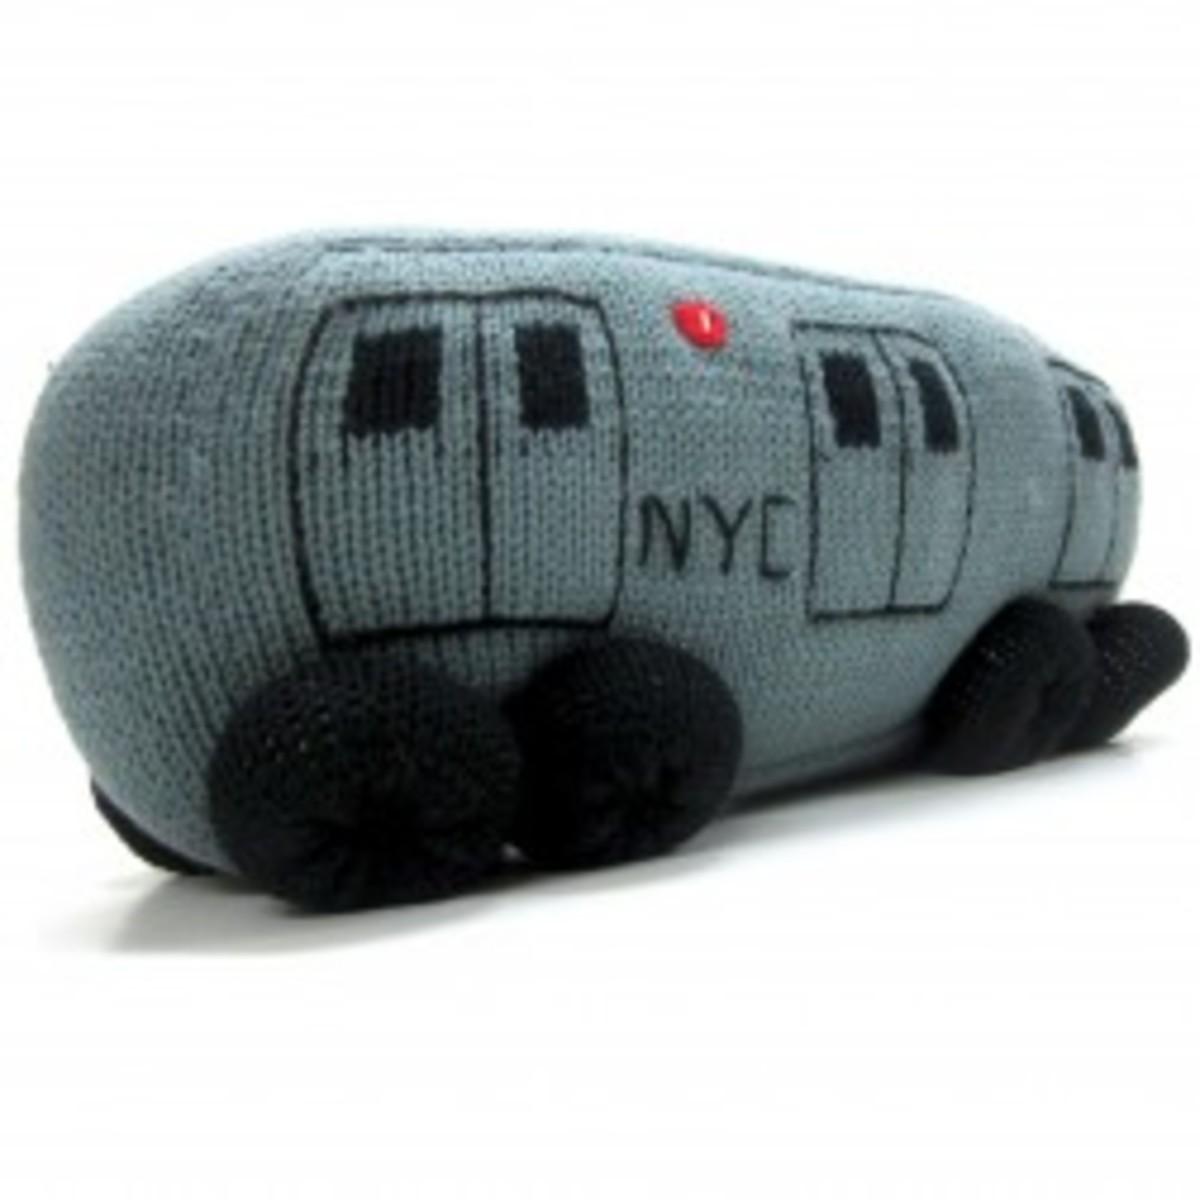 nursery-decor-knit-nyc-train-decorative-pillow